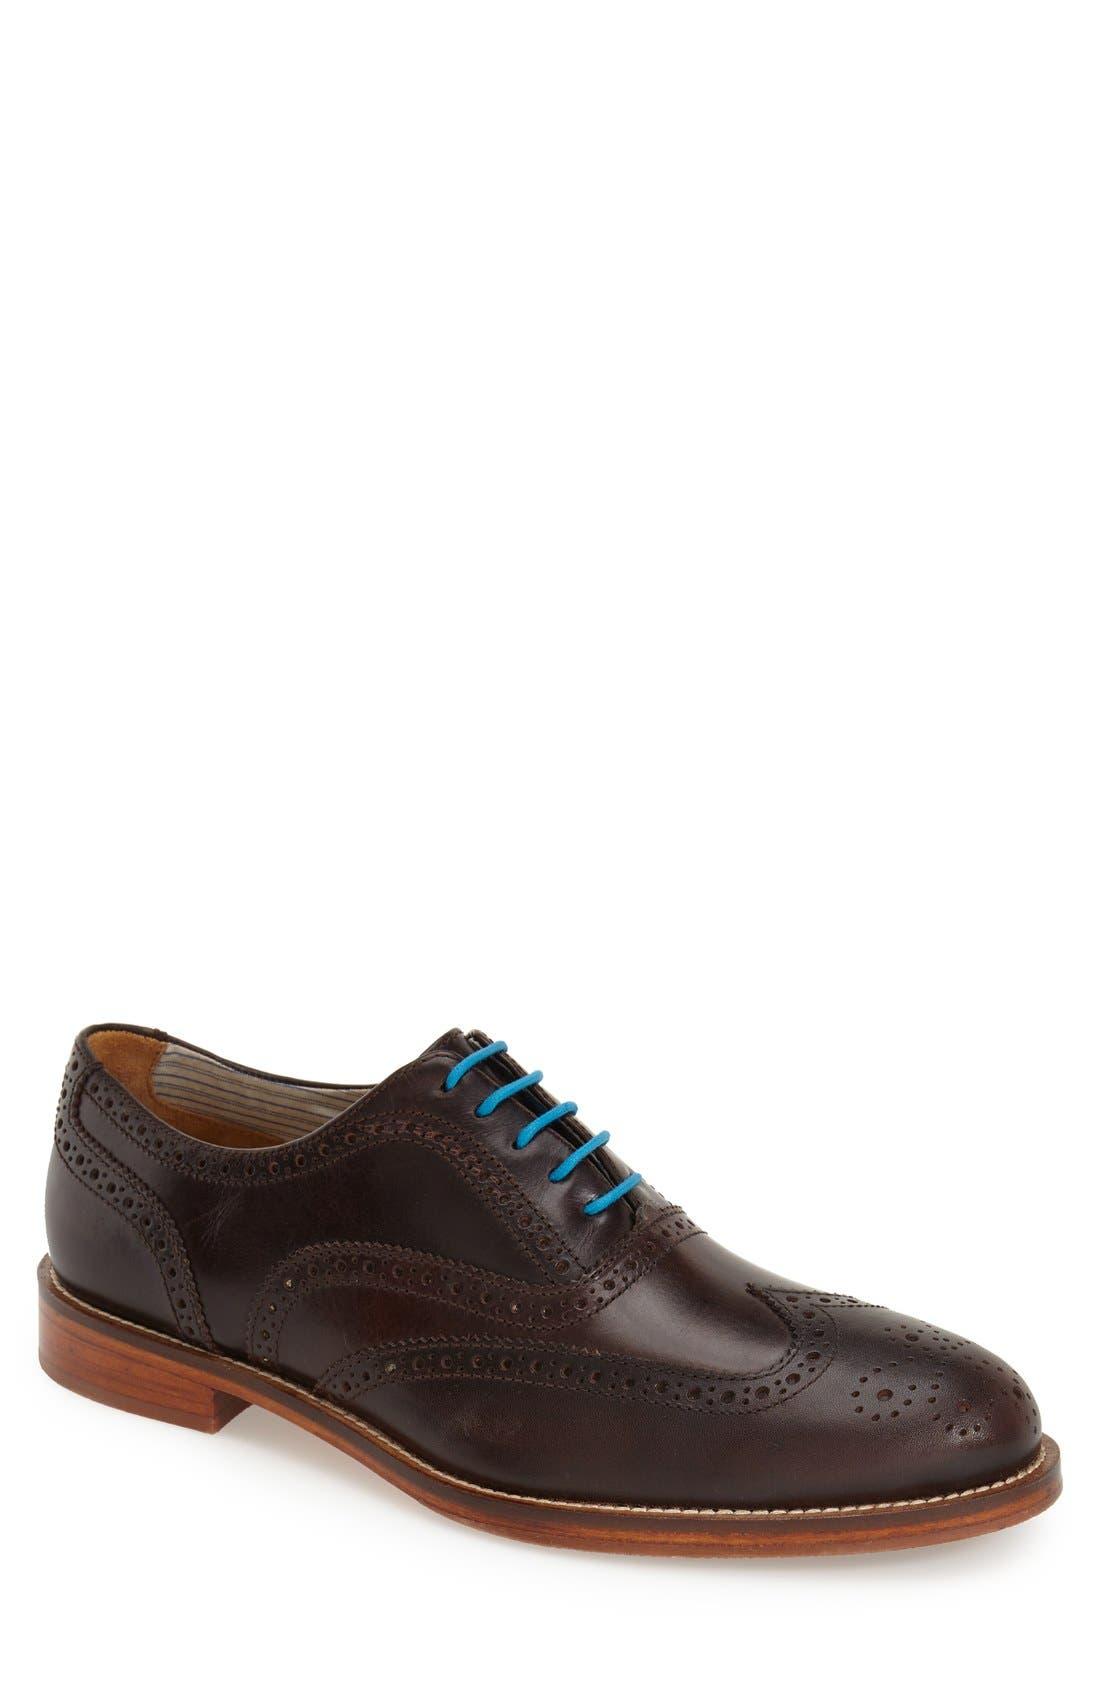 Image of J Shoes Charlie Plus Wingtip Oxford